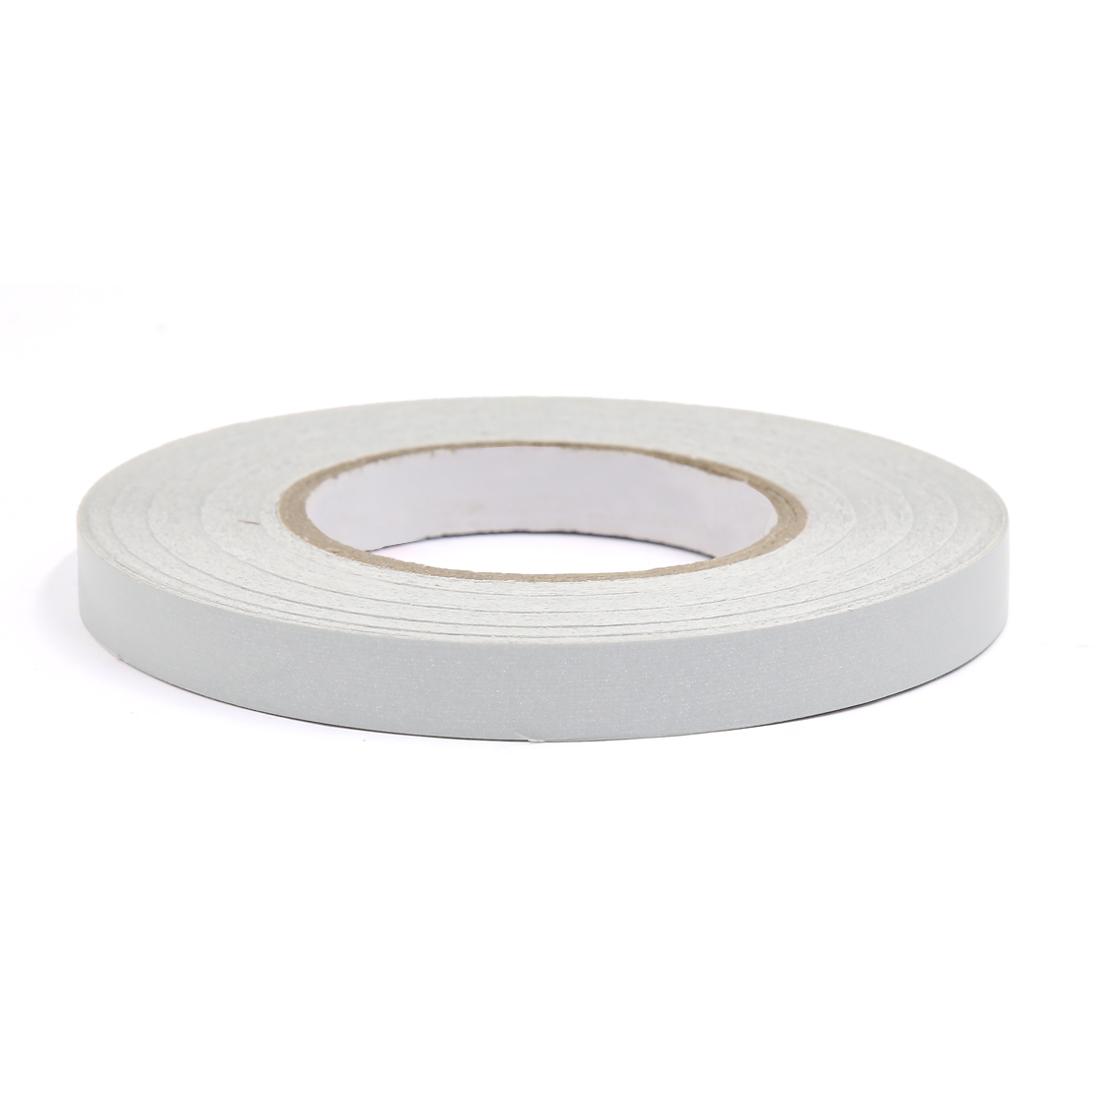 46M White Adhesive Decol Sticker Decoration Reflective Tape Stripe for Car